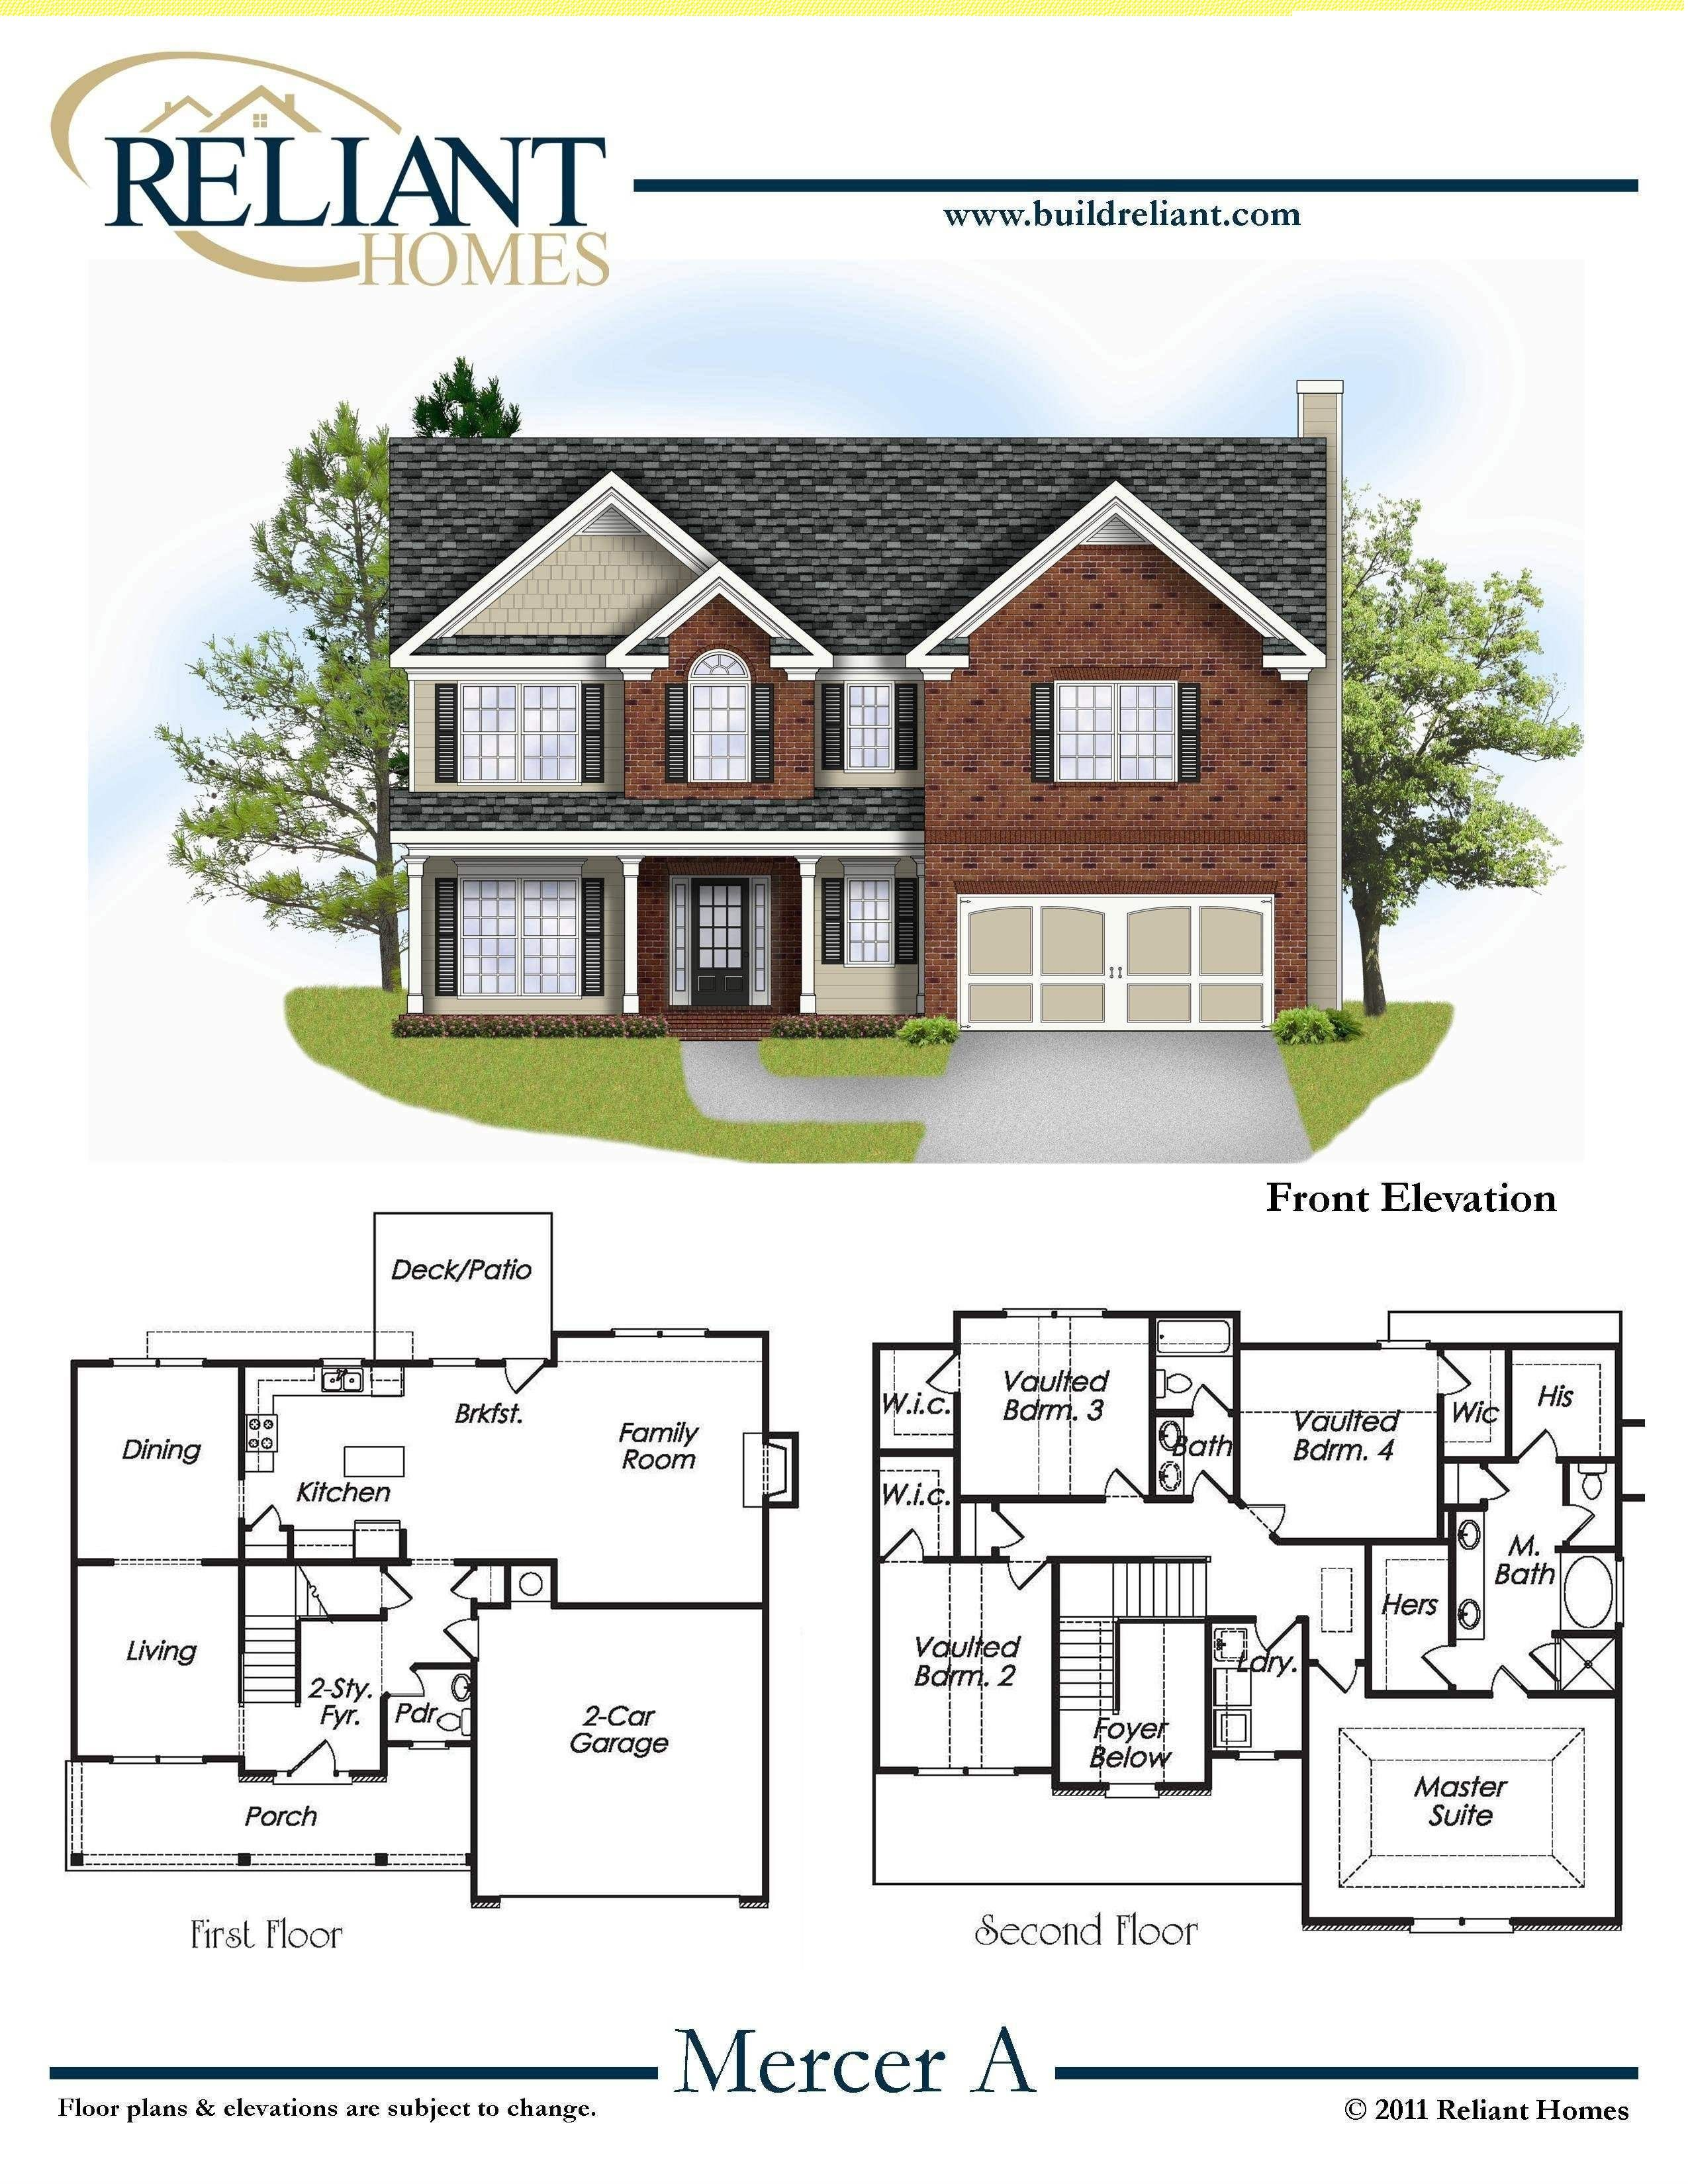 Reliant Homes | The Mercer Plan | Floor Plans | Homes | Homes for ...